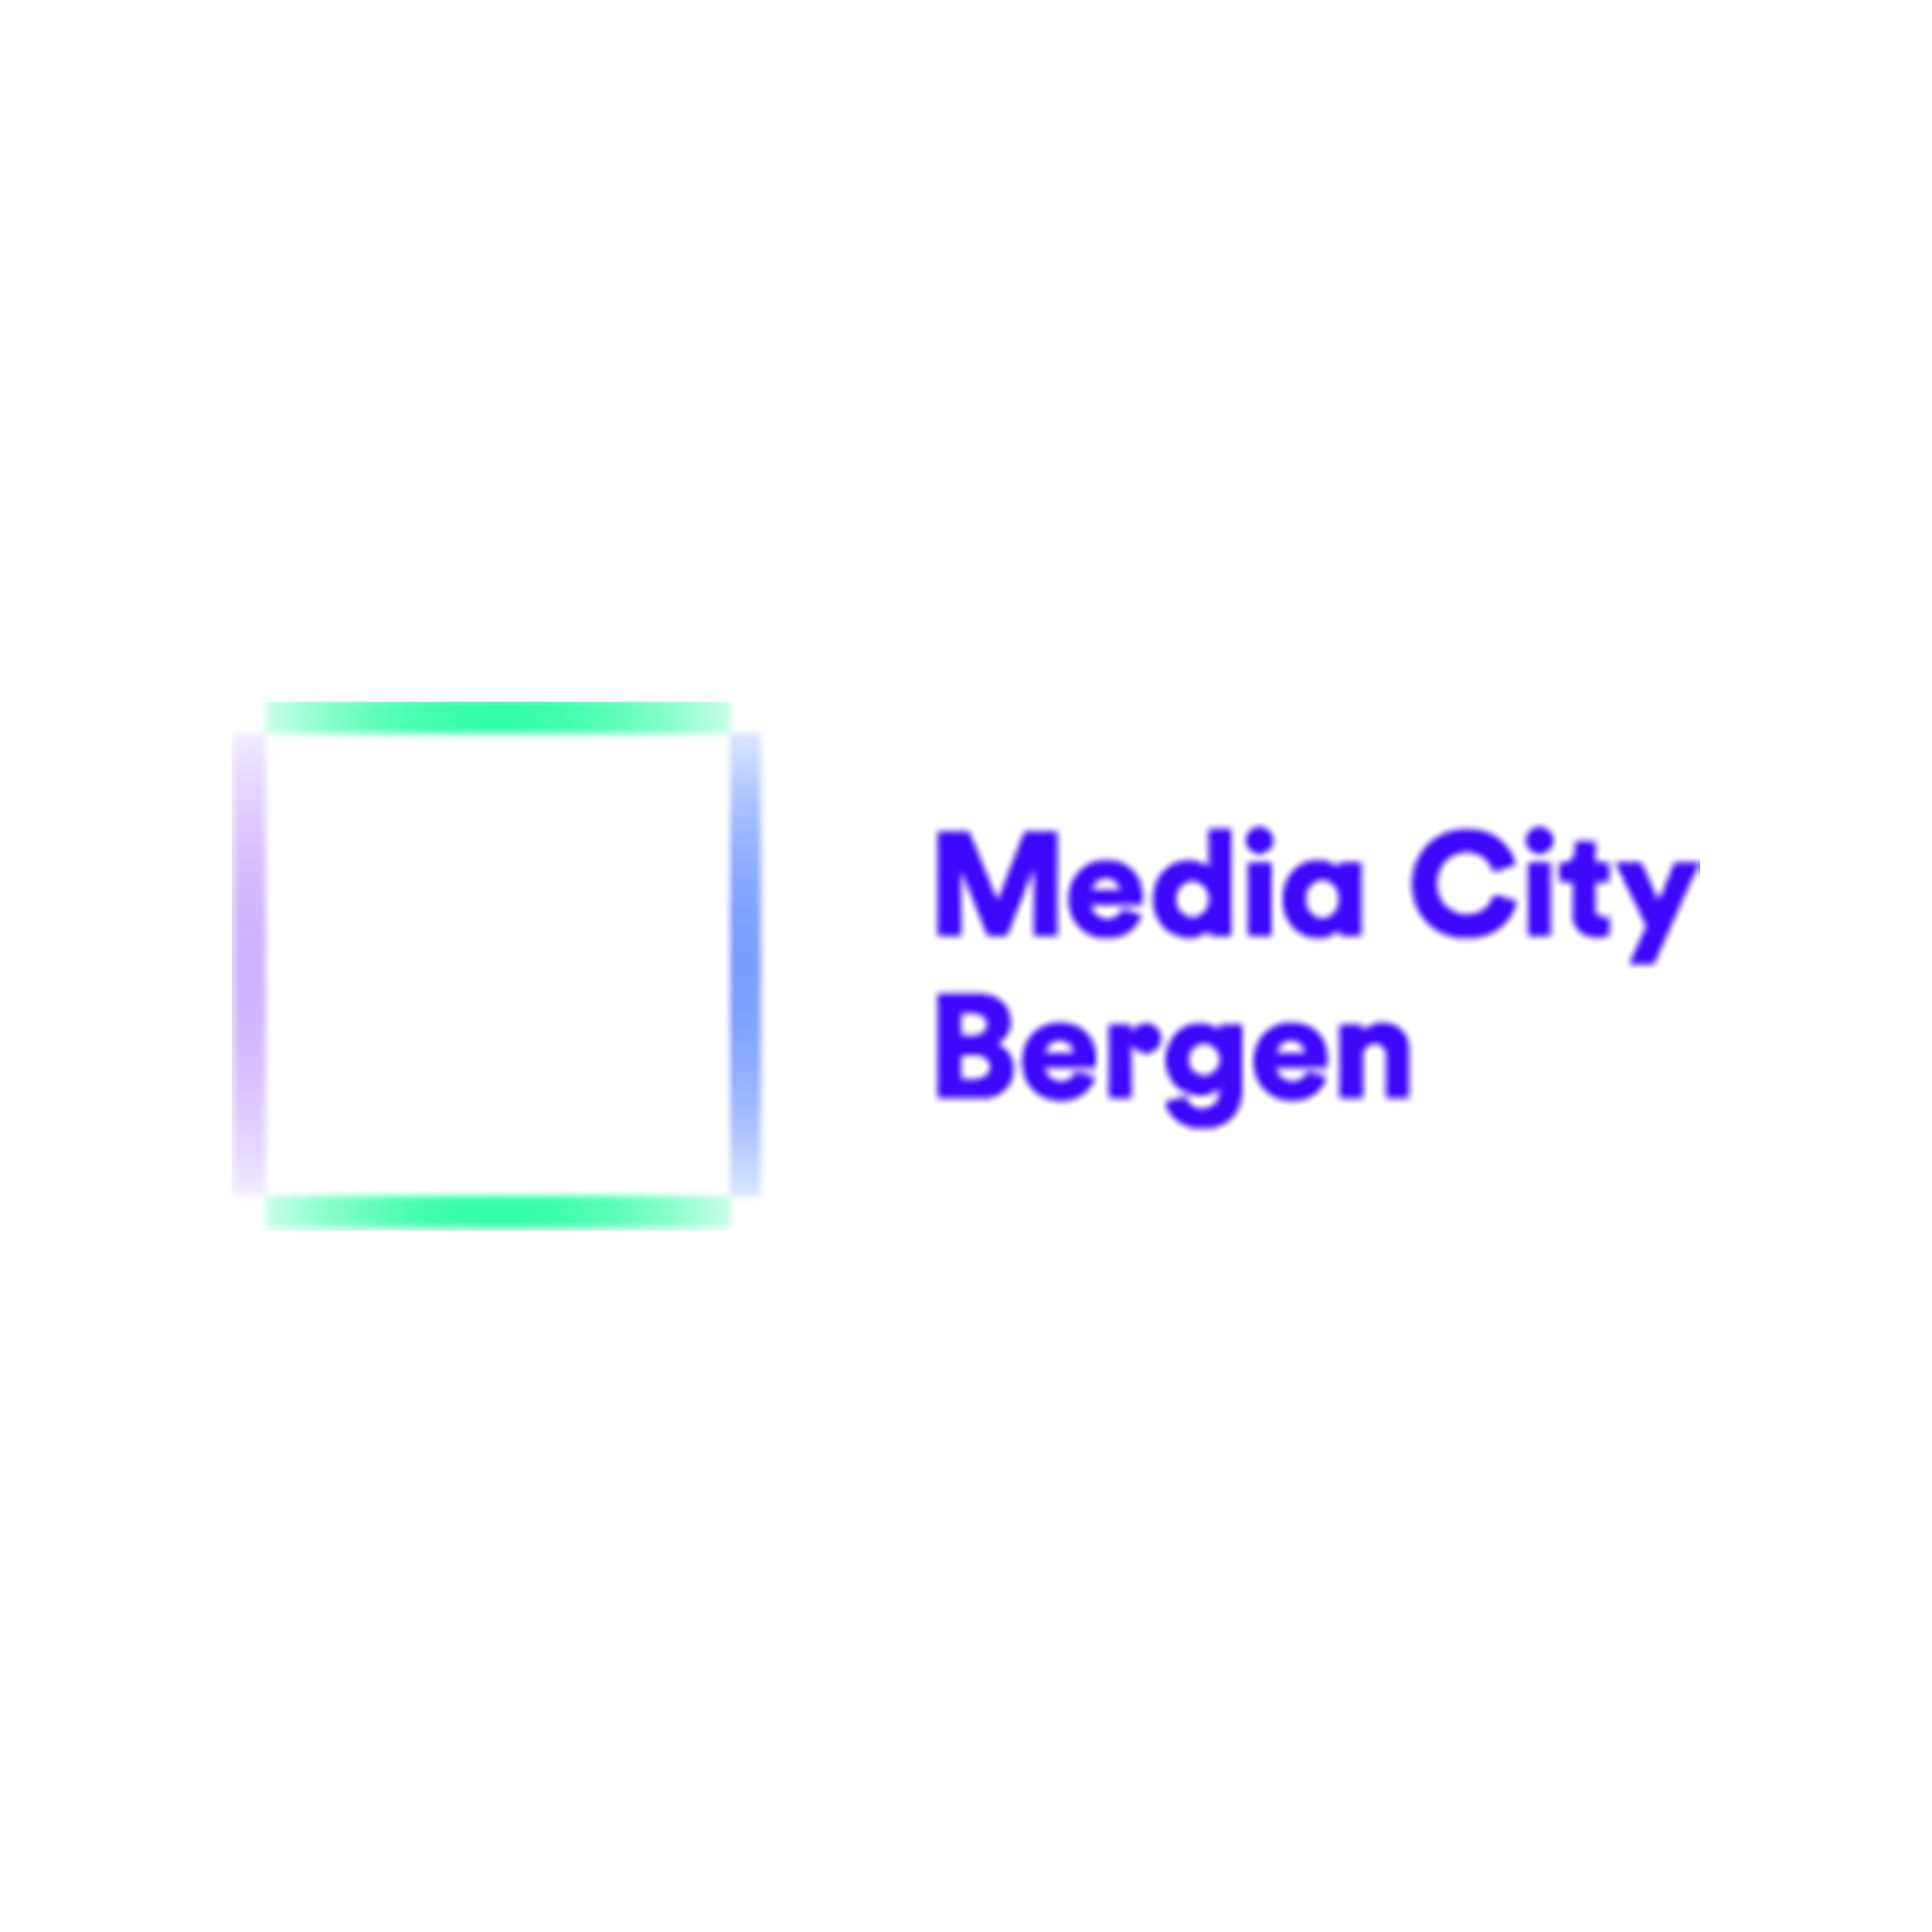 Media City Bergen kopi.png